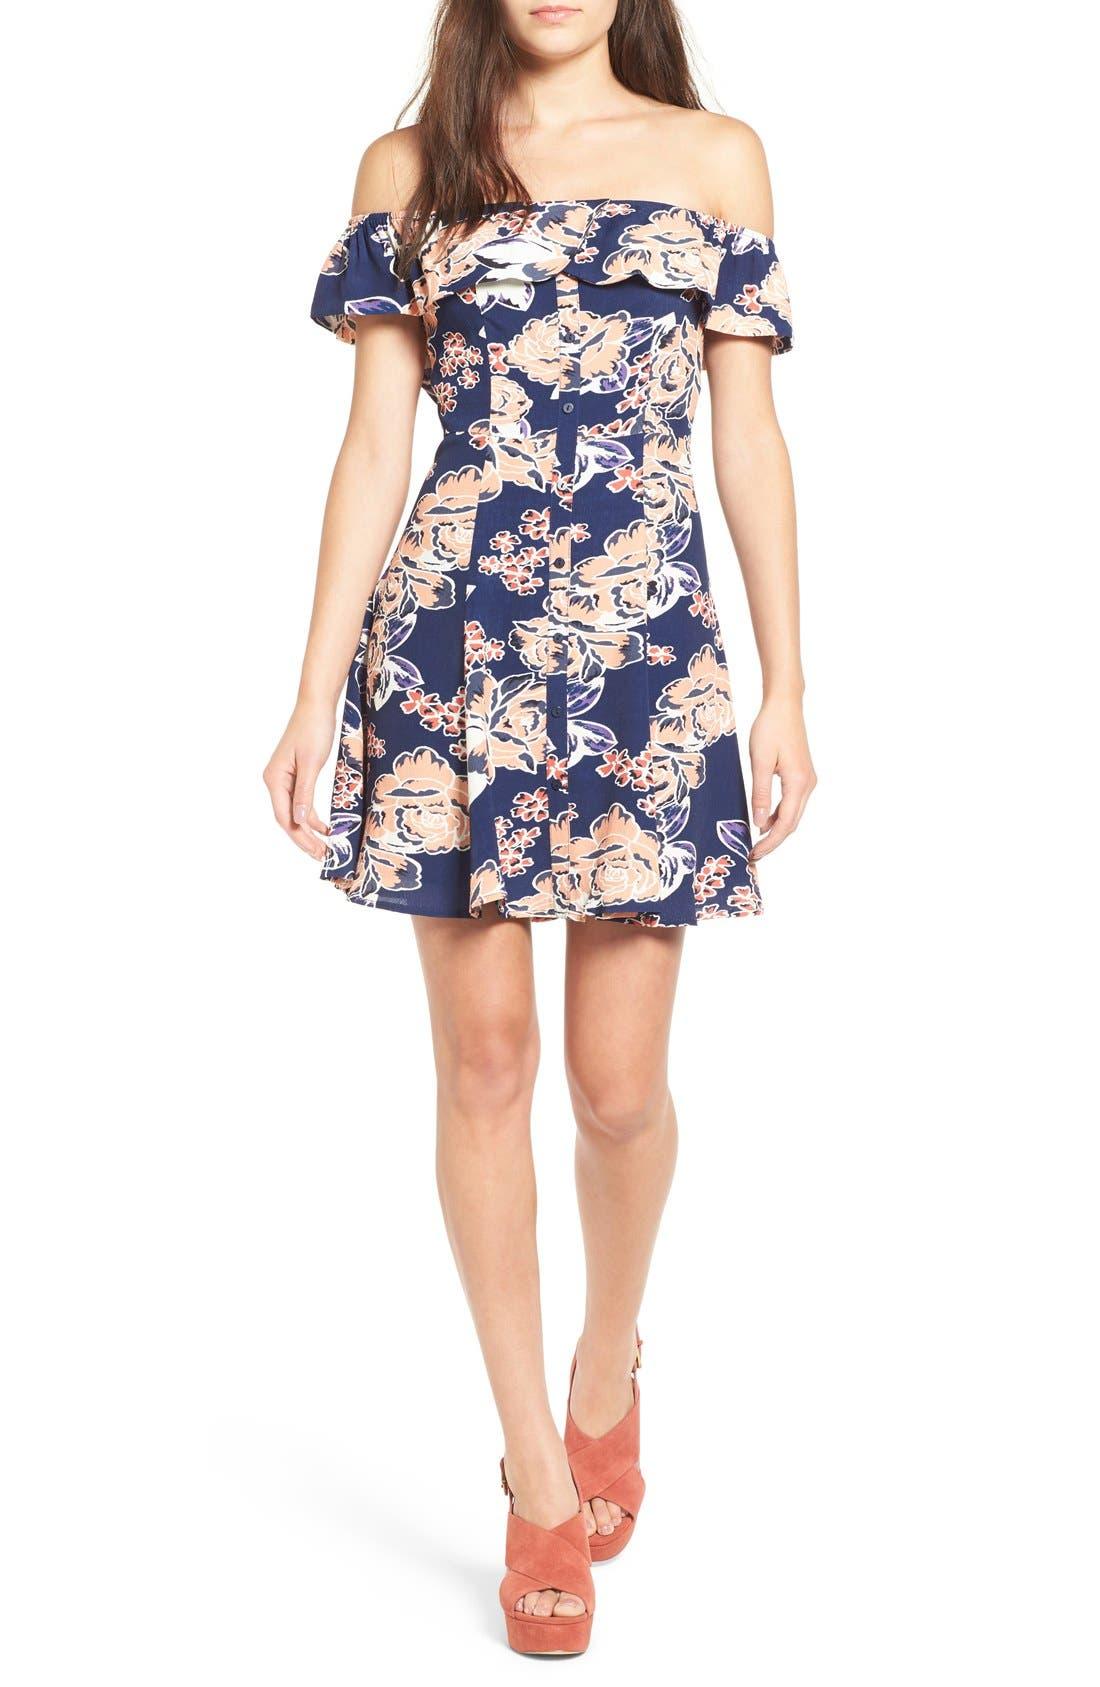 Main Image - Lovers + Friends 'Vineyard' Floral Print Off the Shoulder Minidress